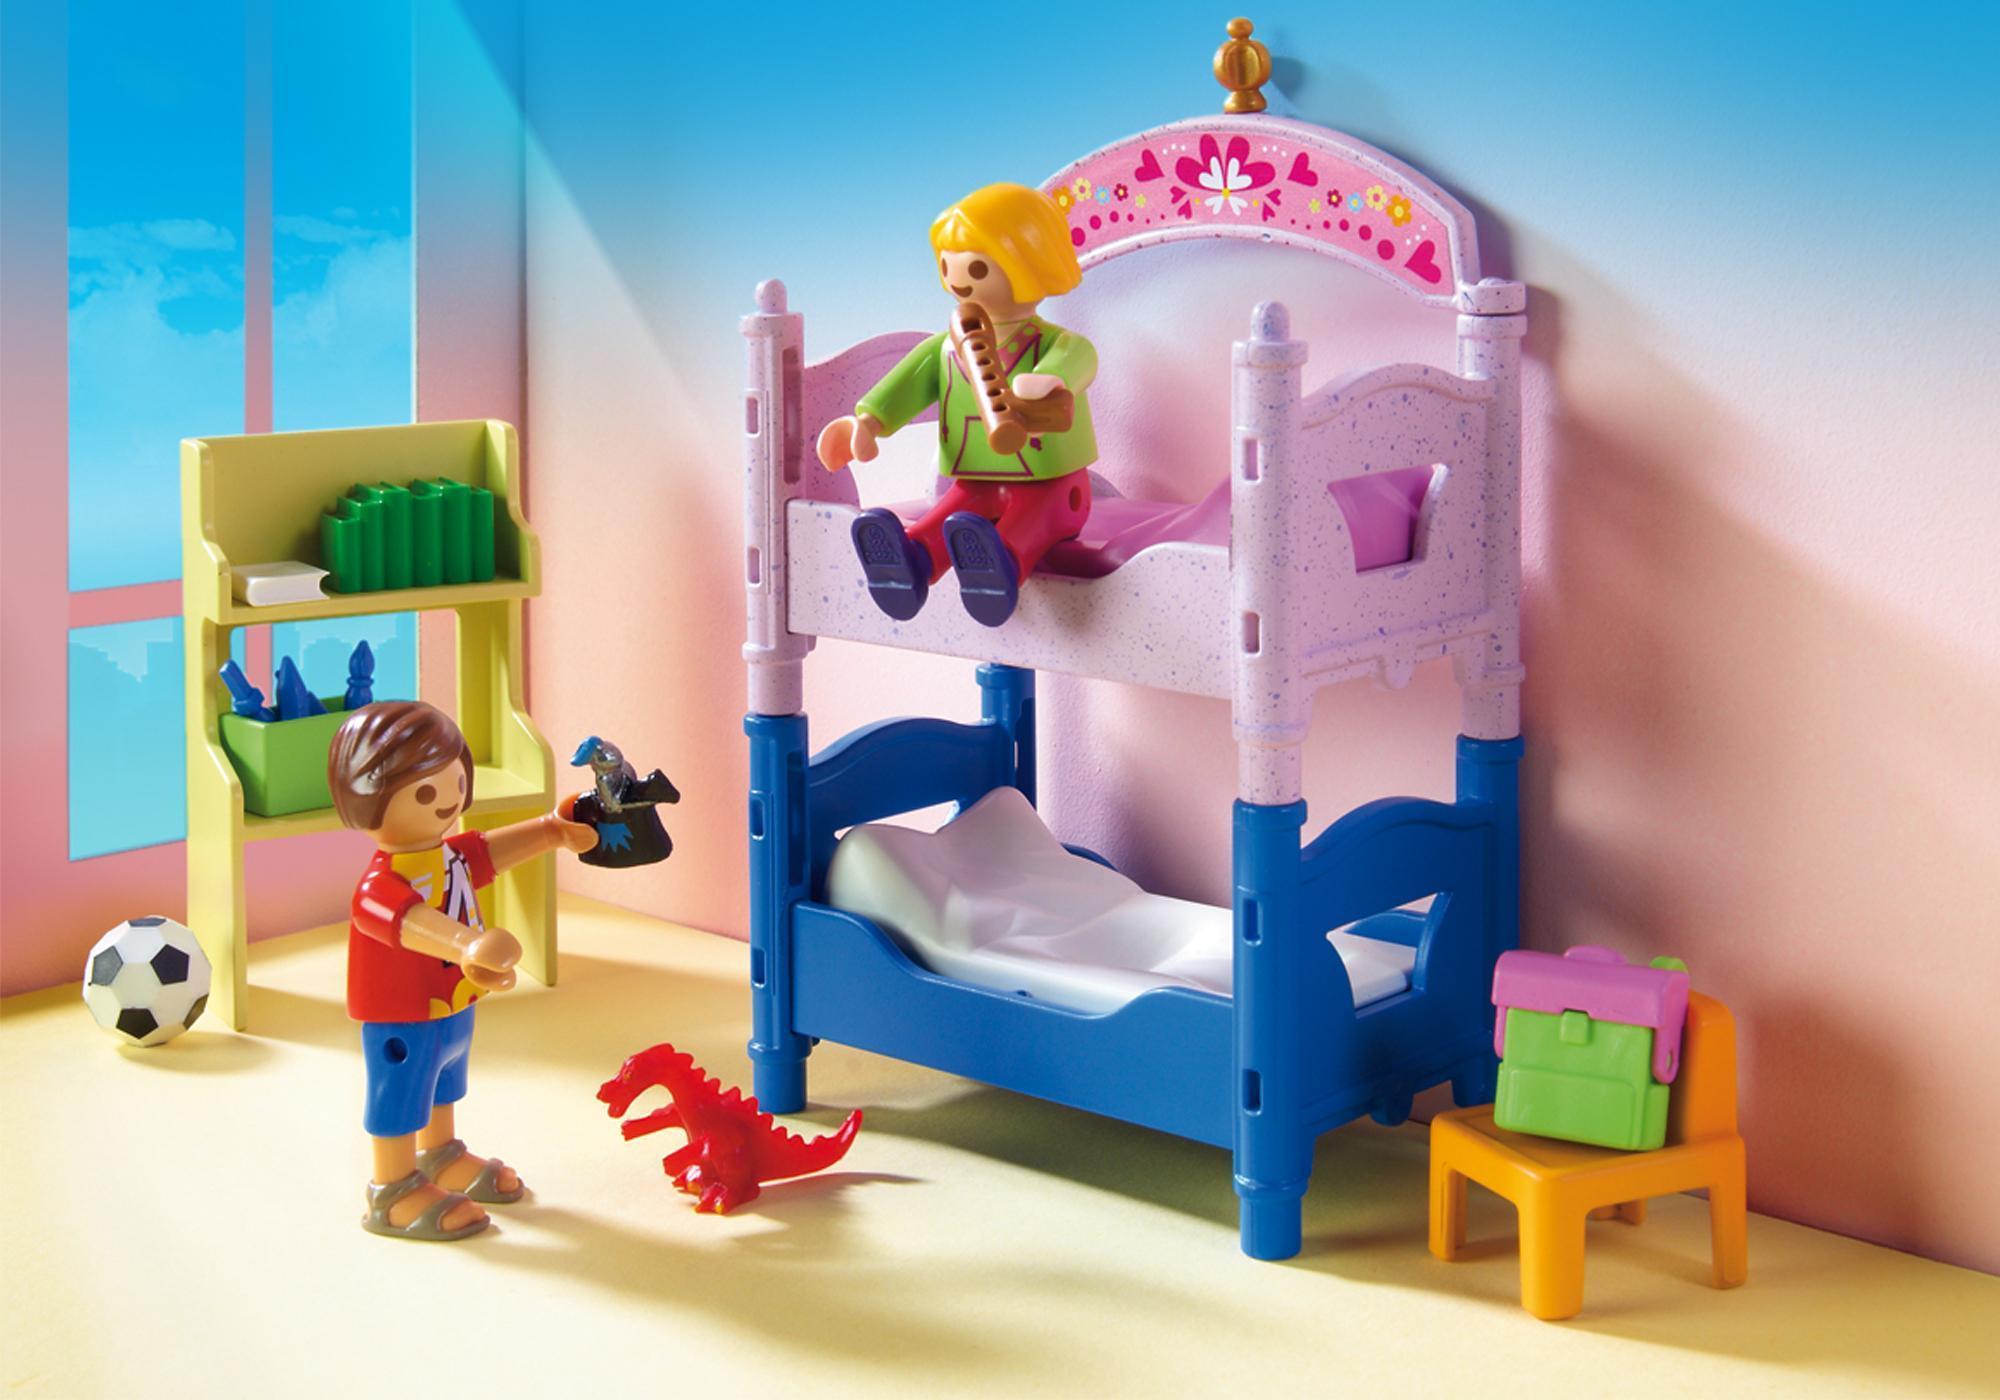 http://media.playmobil.com/i/playmobil/5306_product_extra1/Children's Room